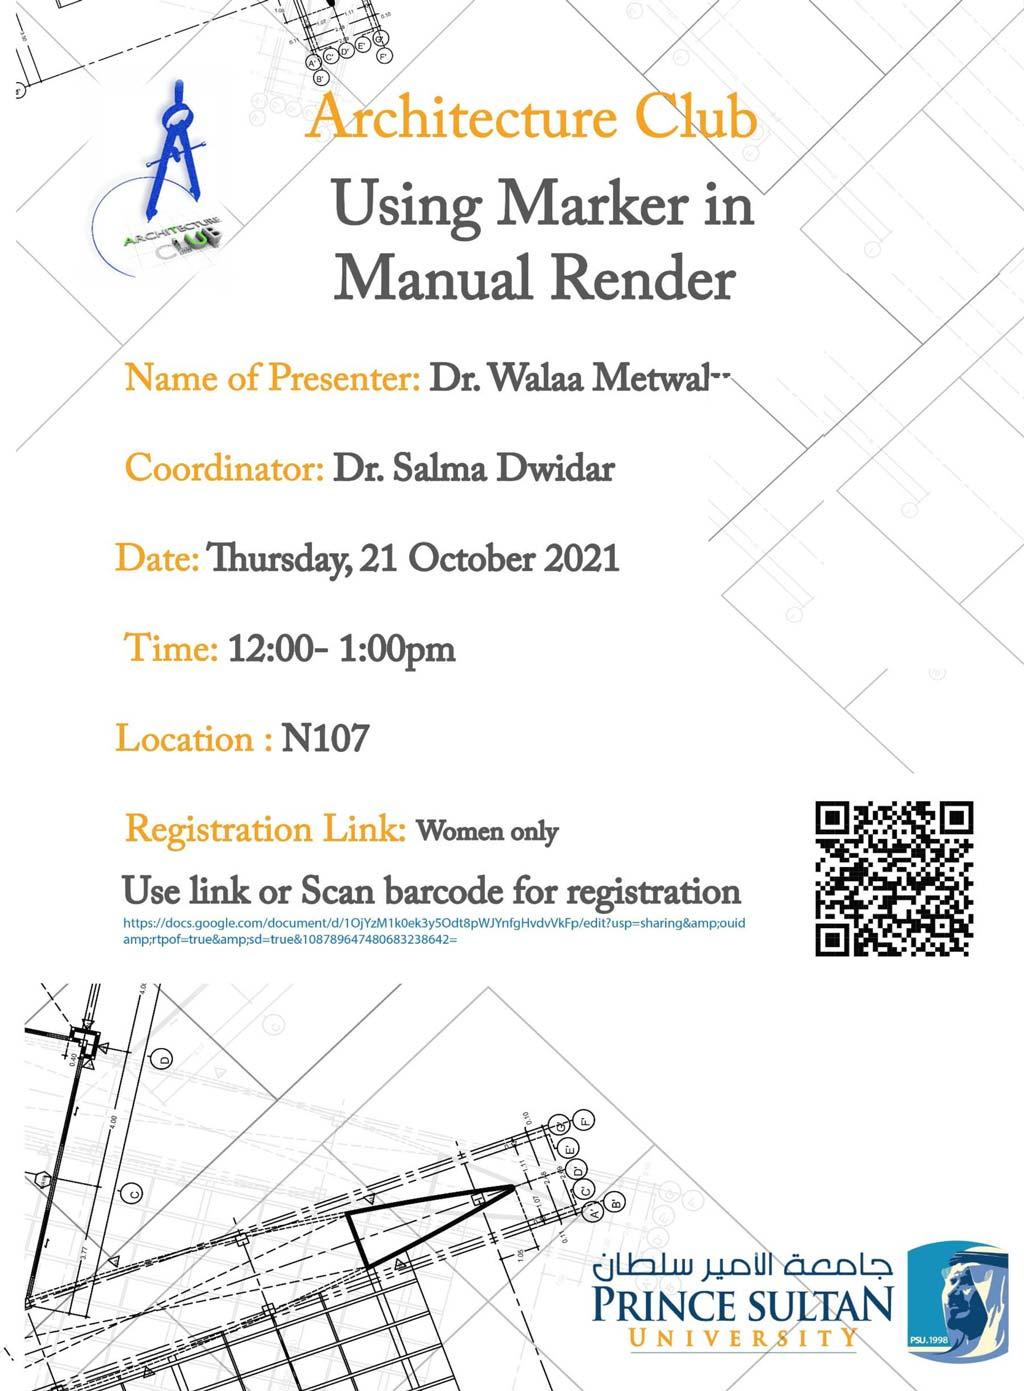 Using Marker in Manual Render